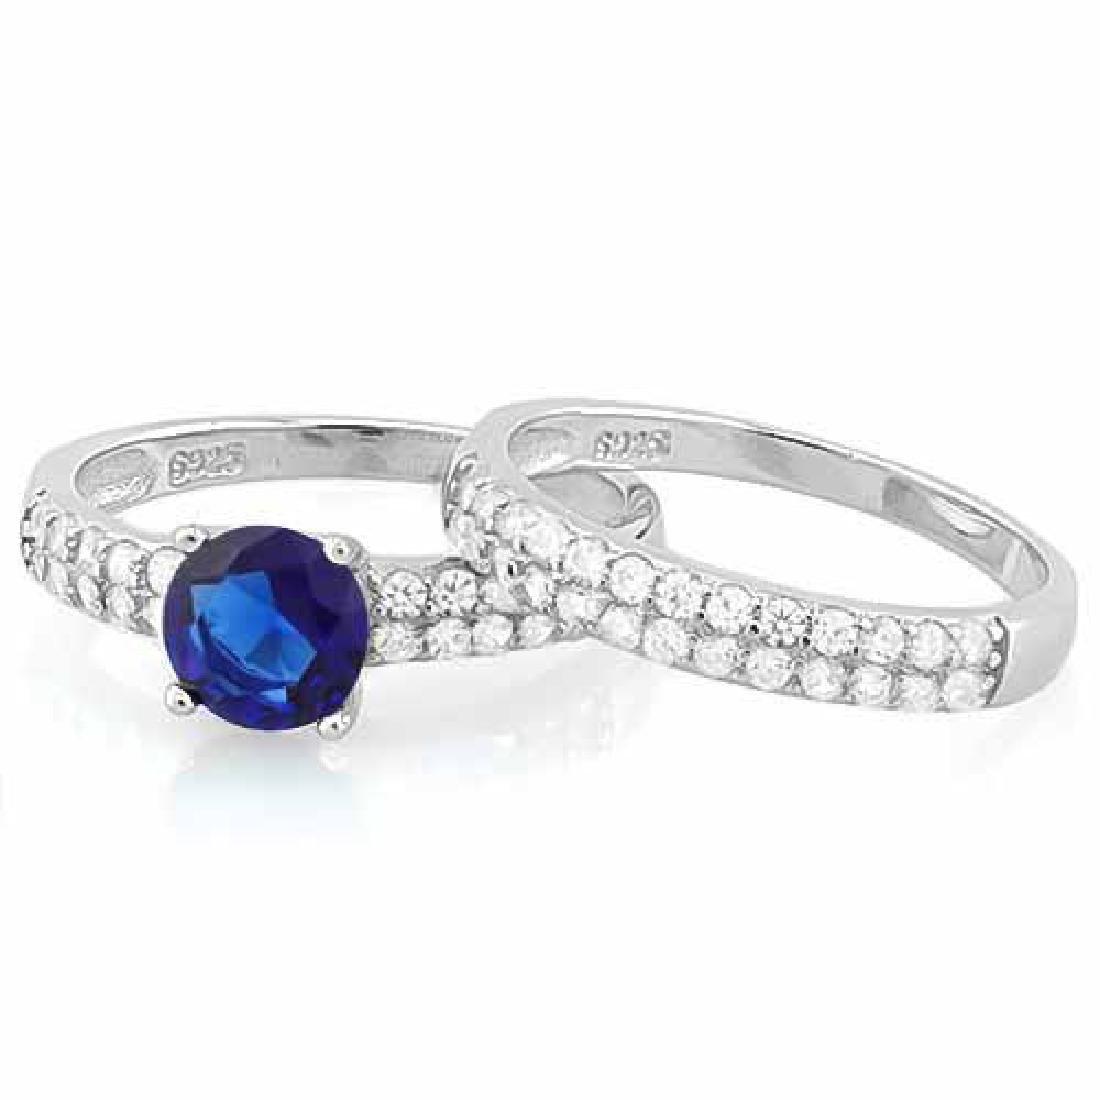 1 1/3 CARAT CREATED BLUE SAPPHIRE & 1/2 CARAT (52 PCS)